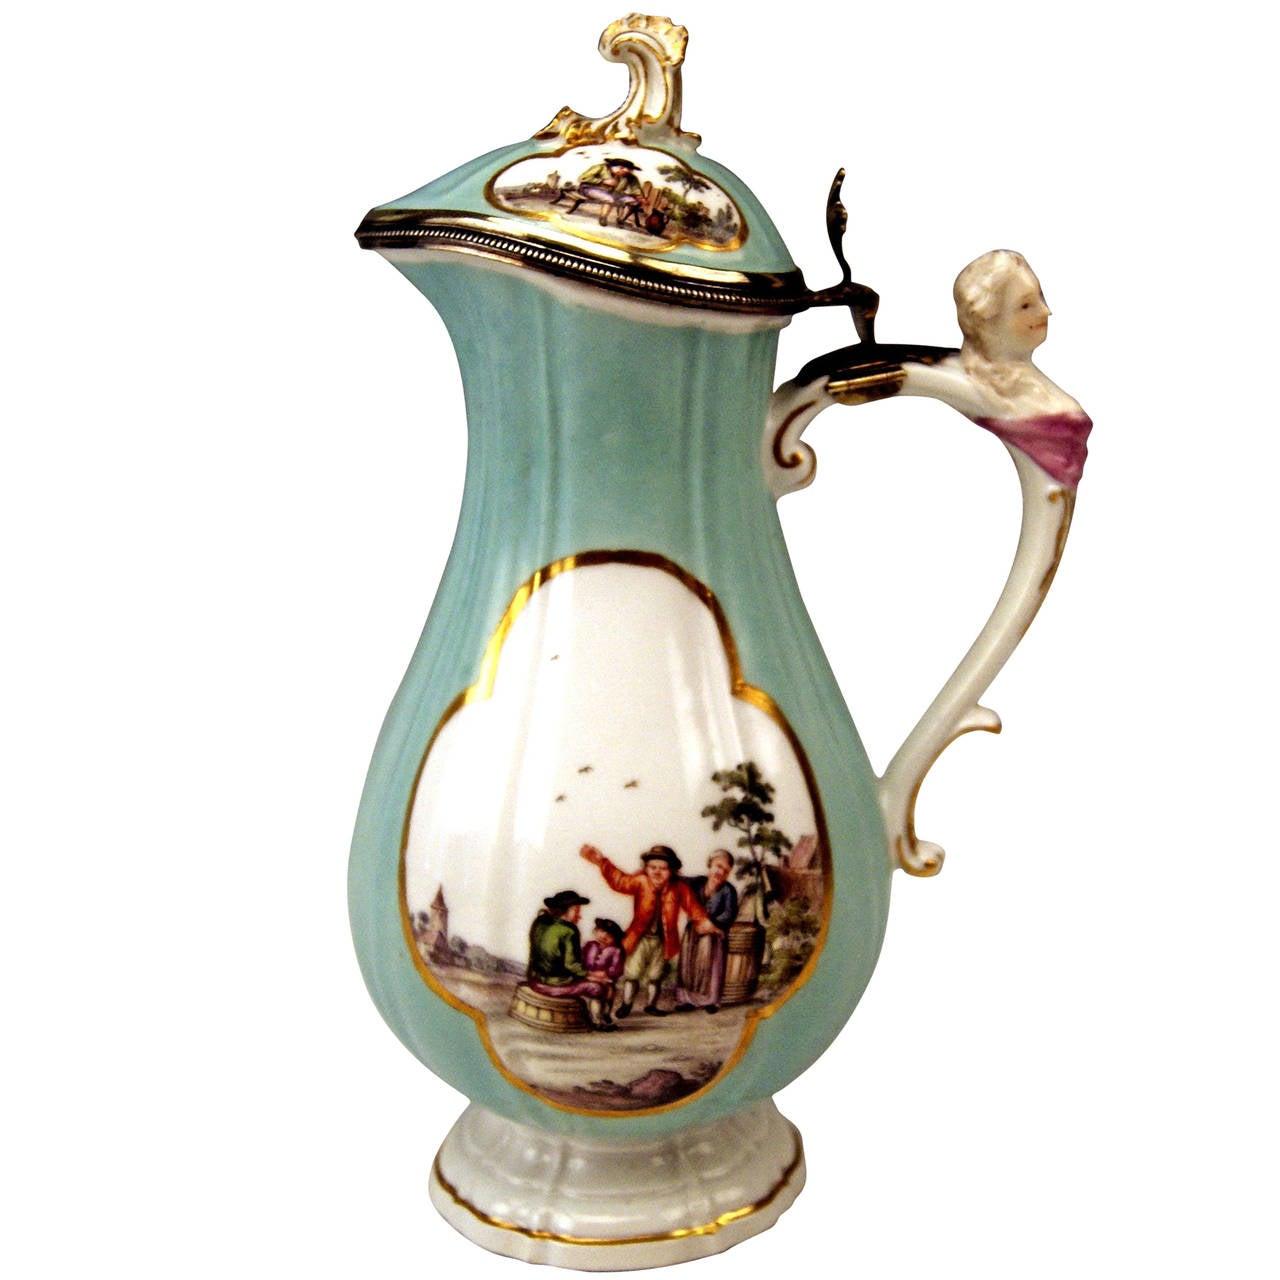 Meissen Lidded Coffee Pot Rococo Period, Made circa 1750